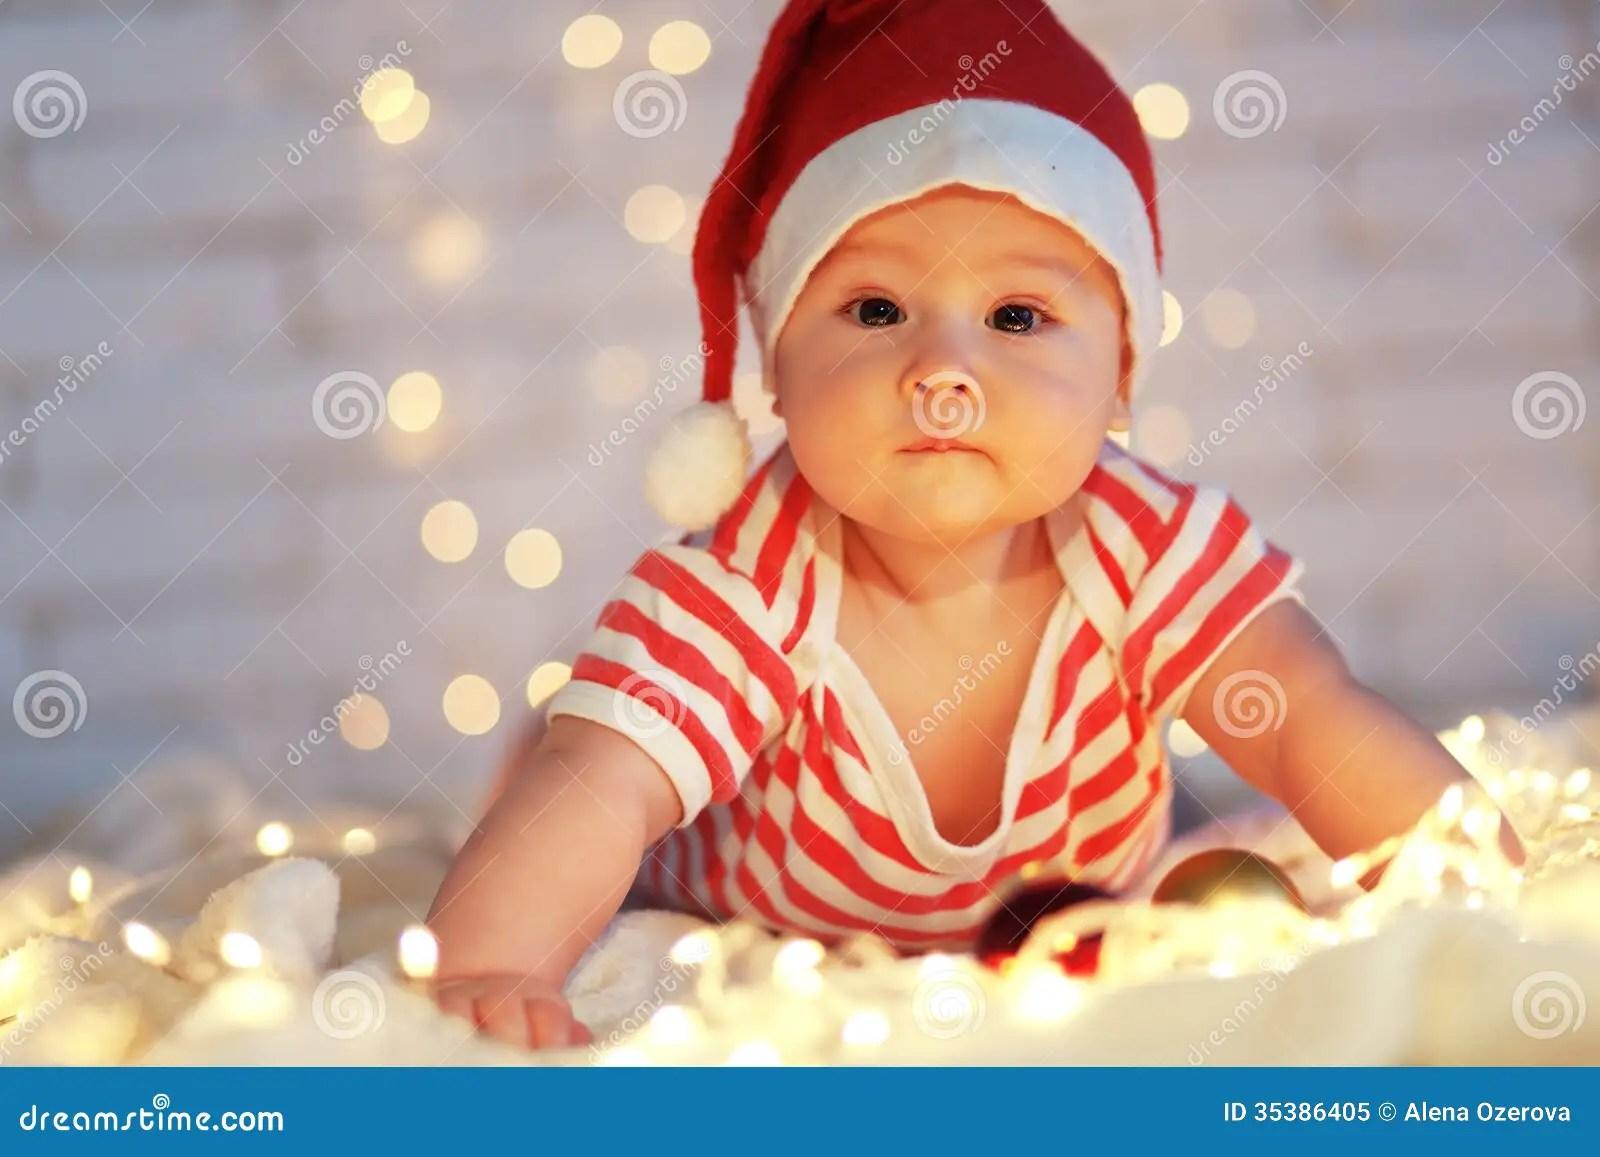 Baby Fotoshooting Ideen 1 Jahr